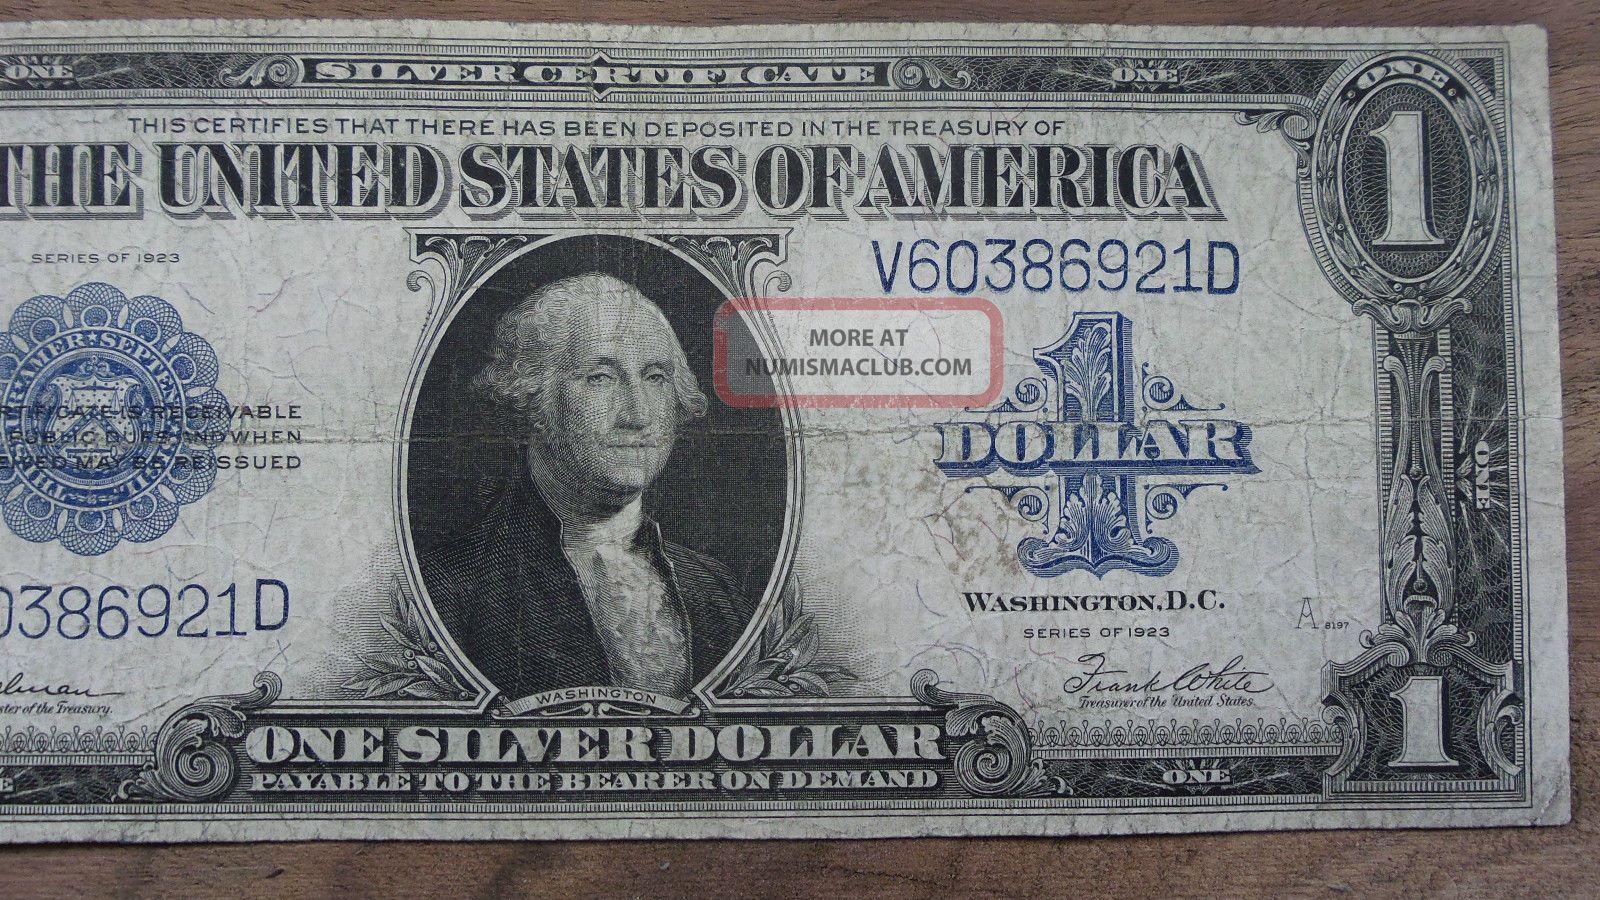 Value Of 1923 Series Dollar Bill Watch Lost Episode 7 Season 6